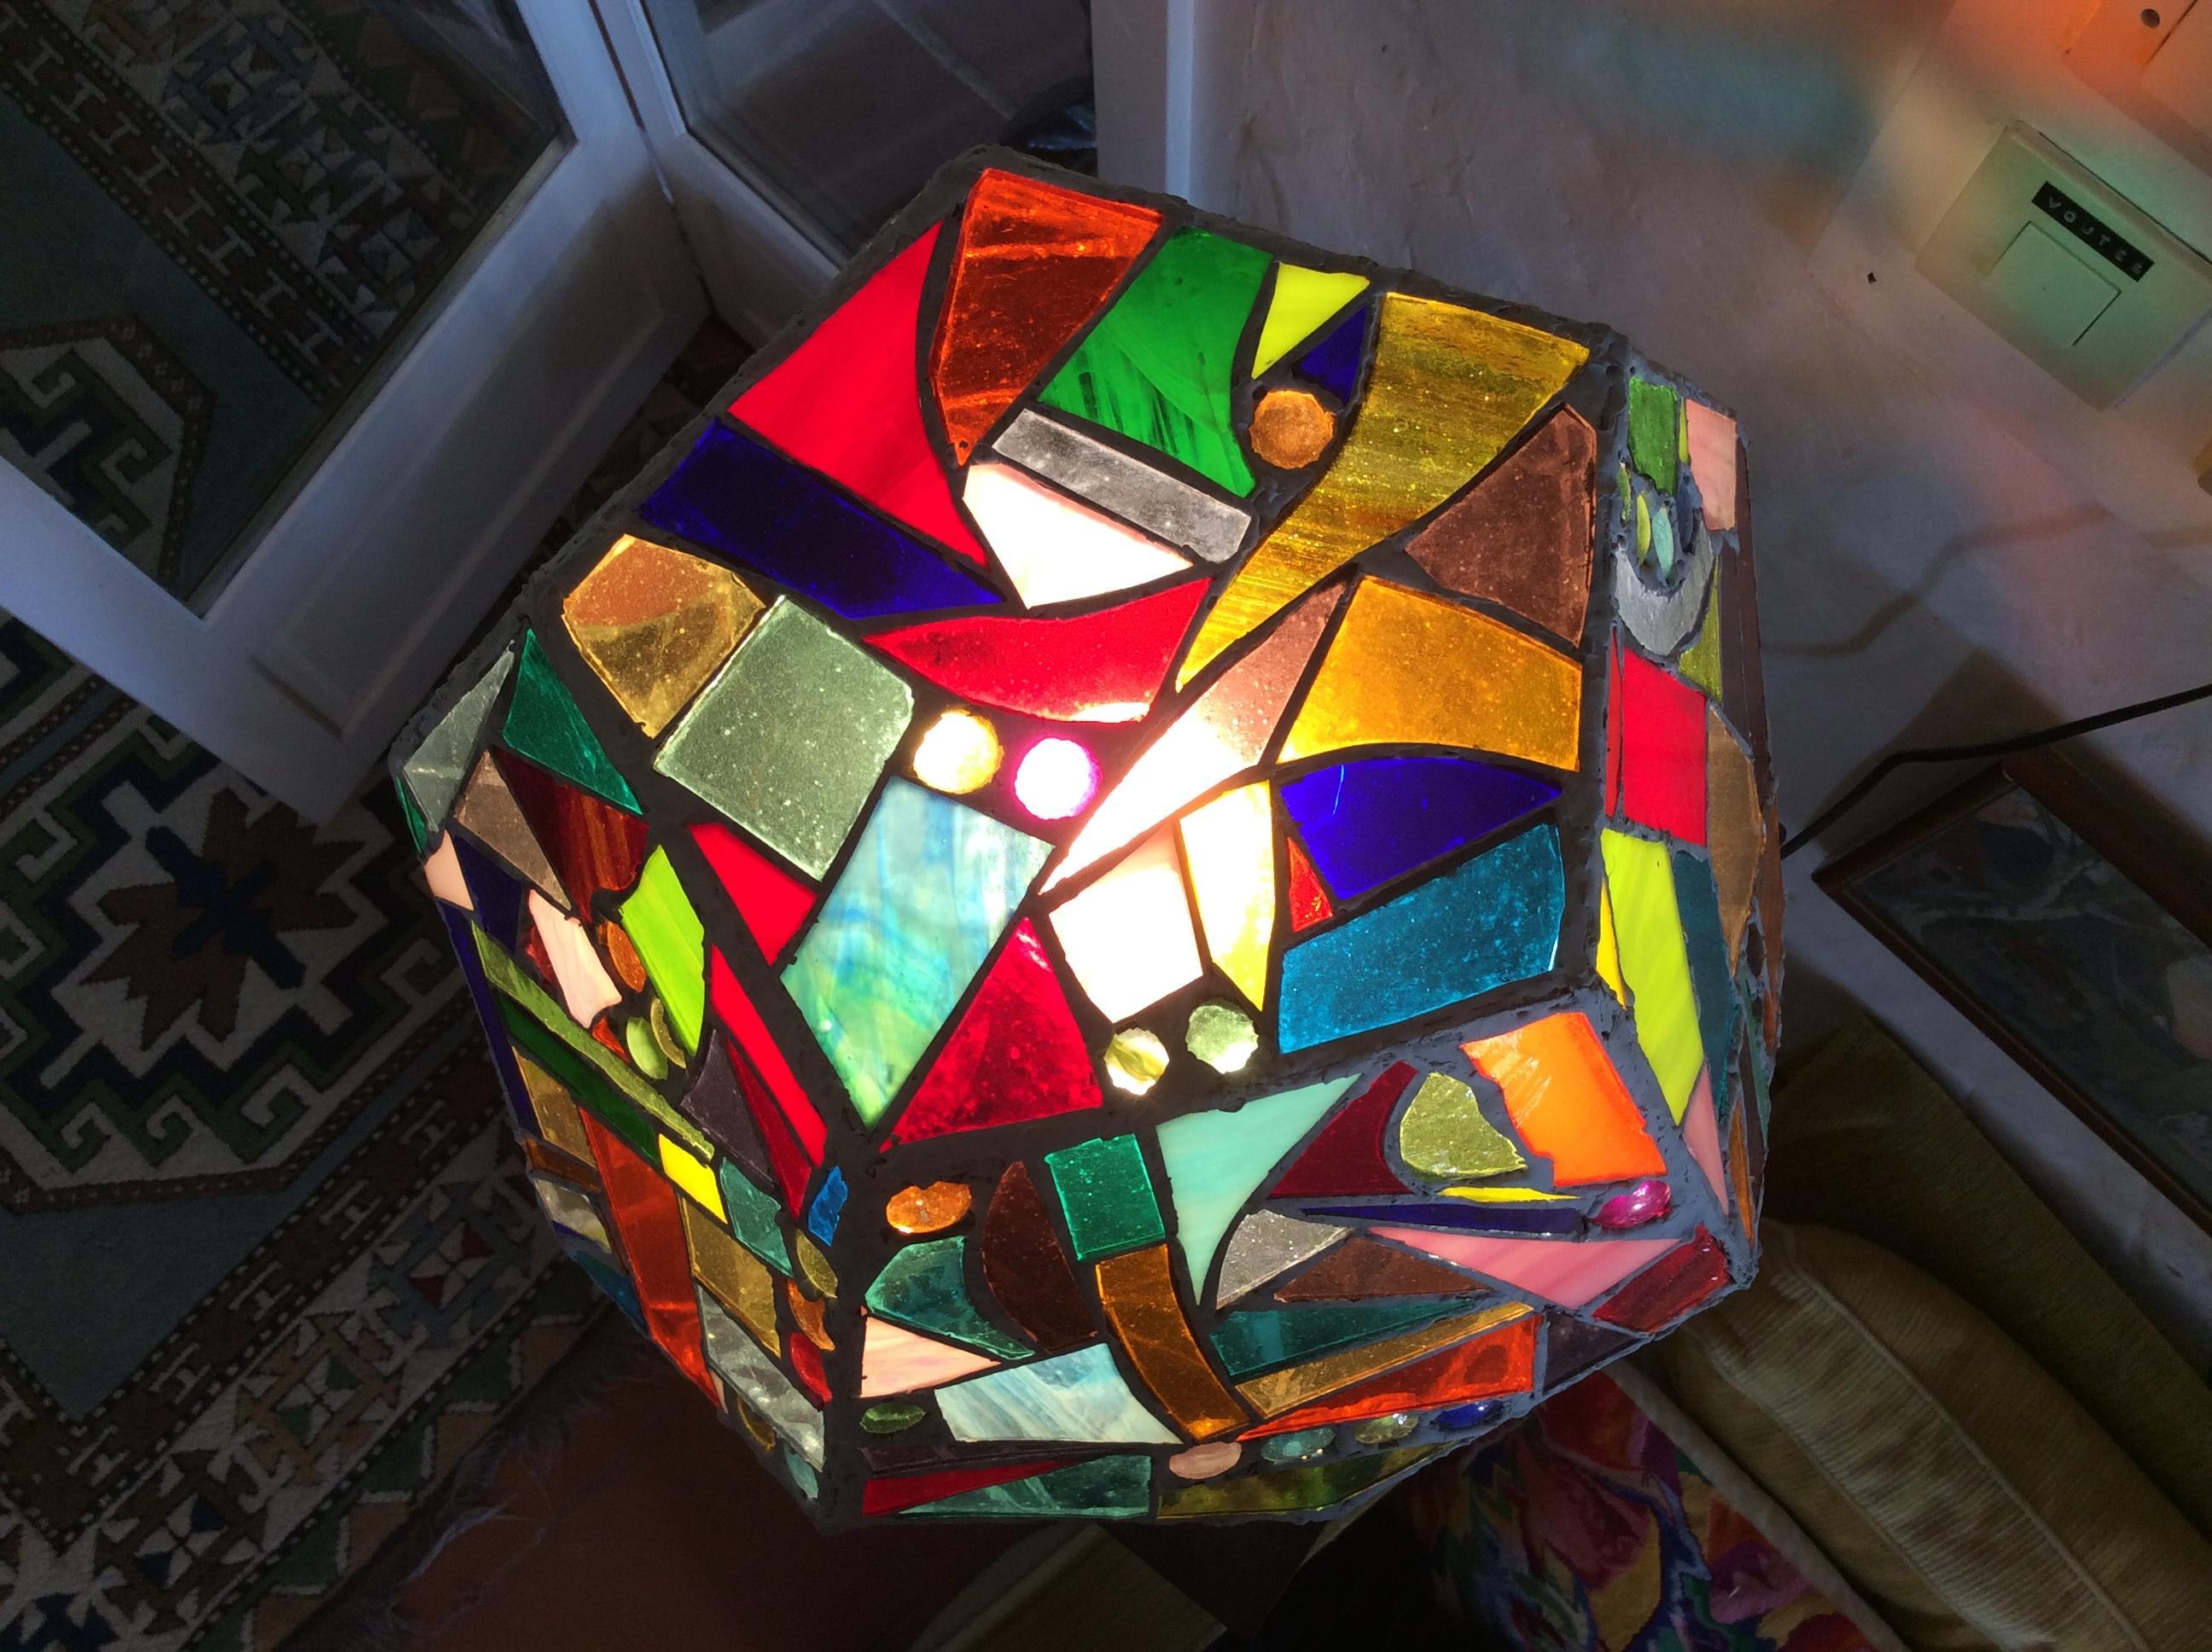 Lampe art deco vitrail tiffany louis comfort tiffany u wikipédia